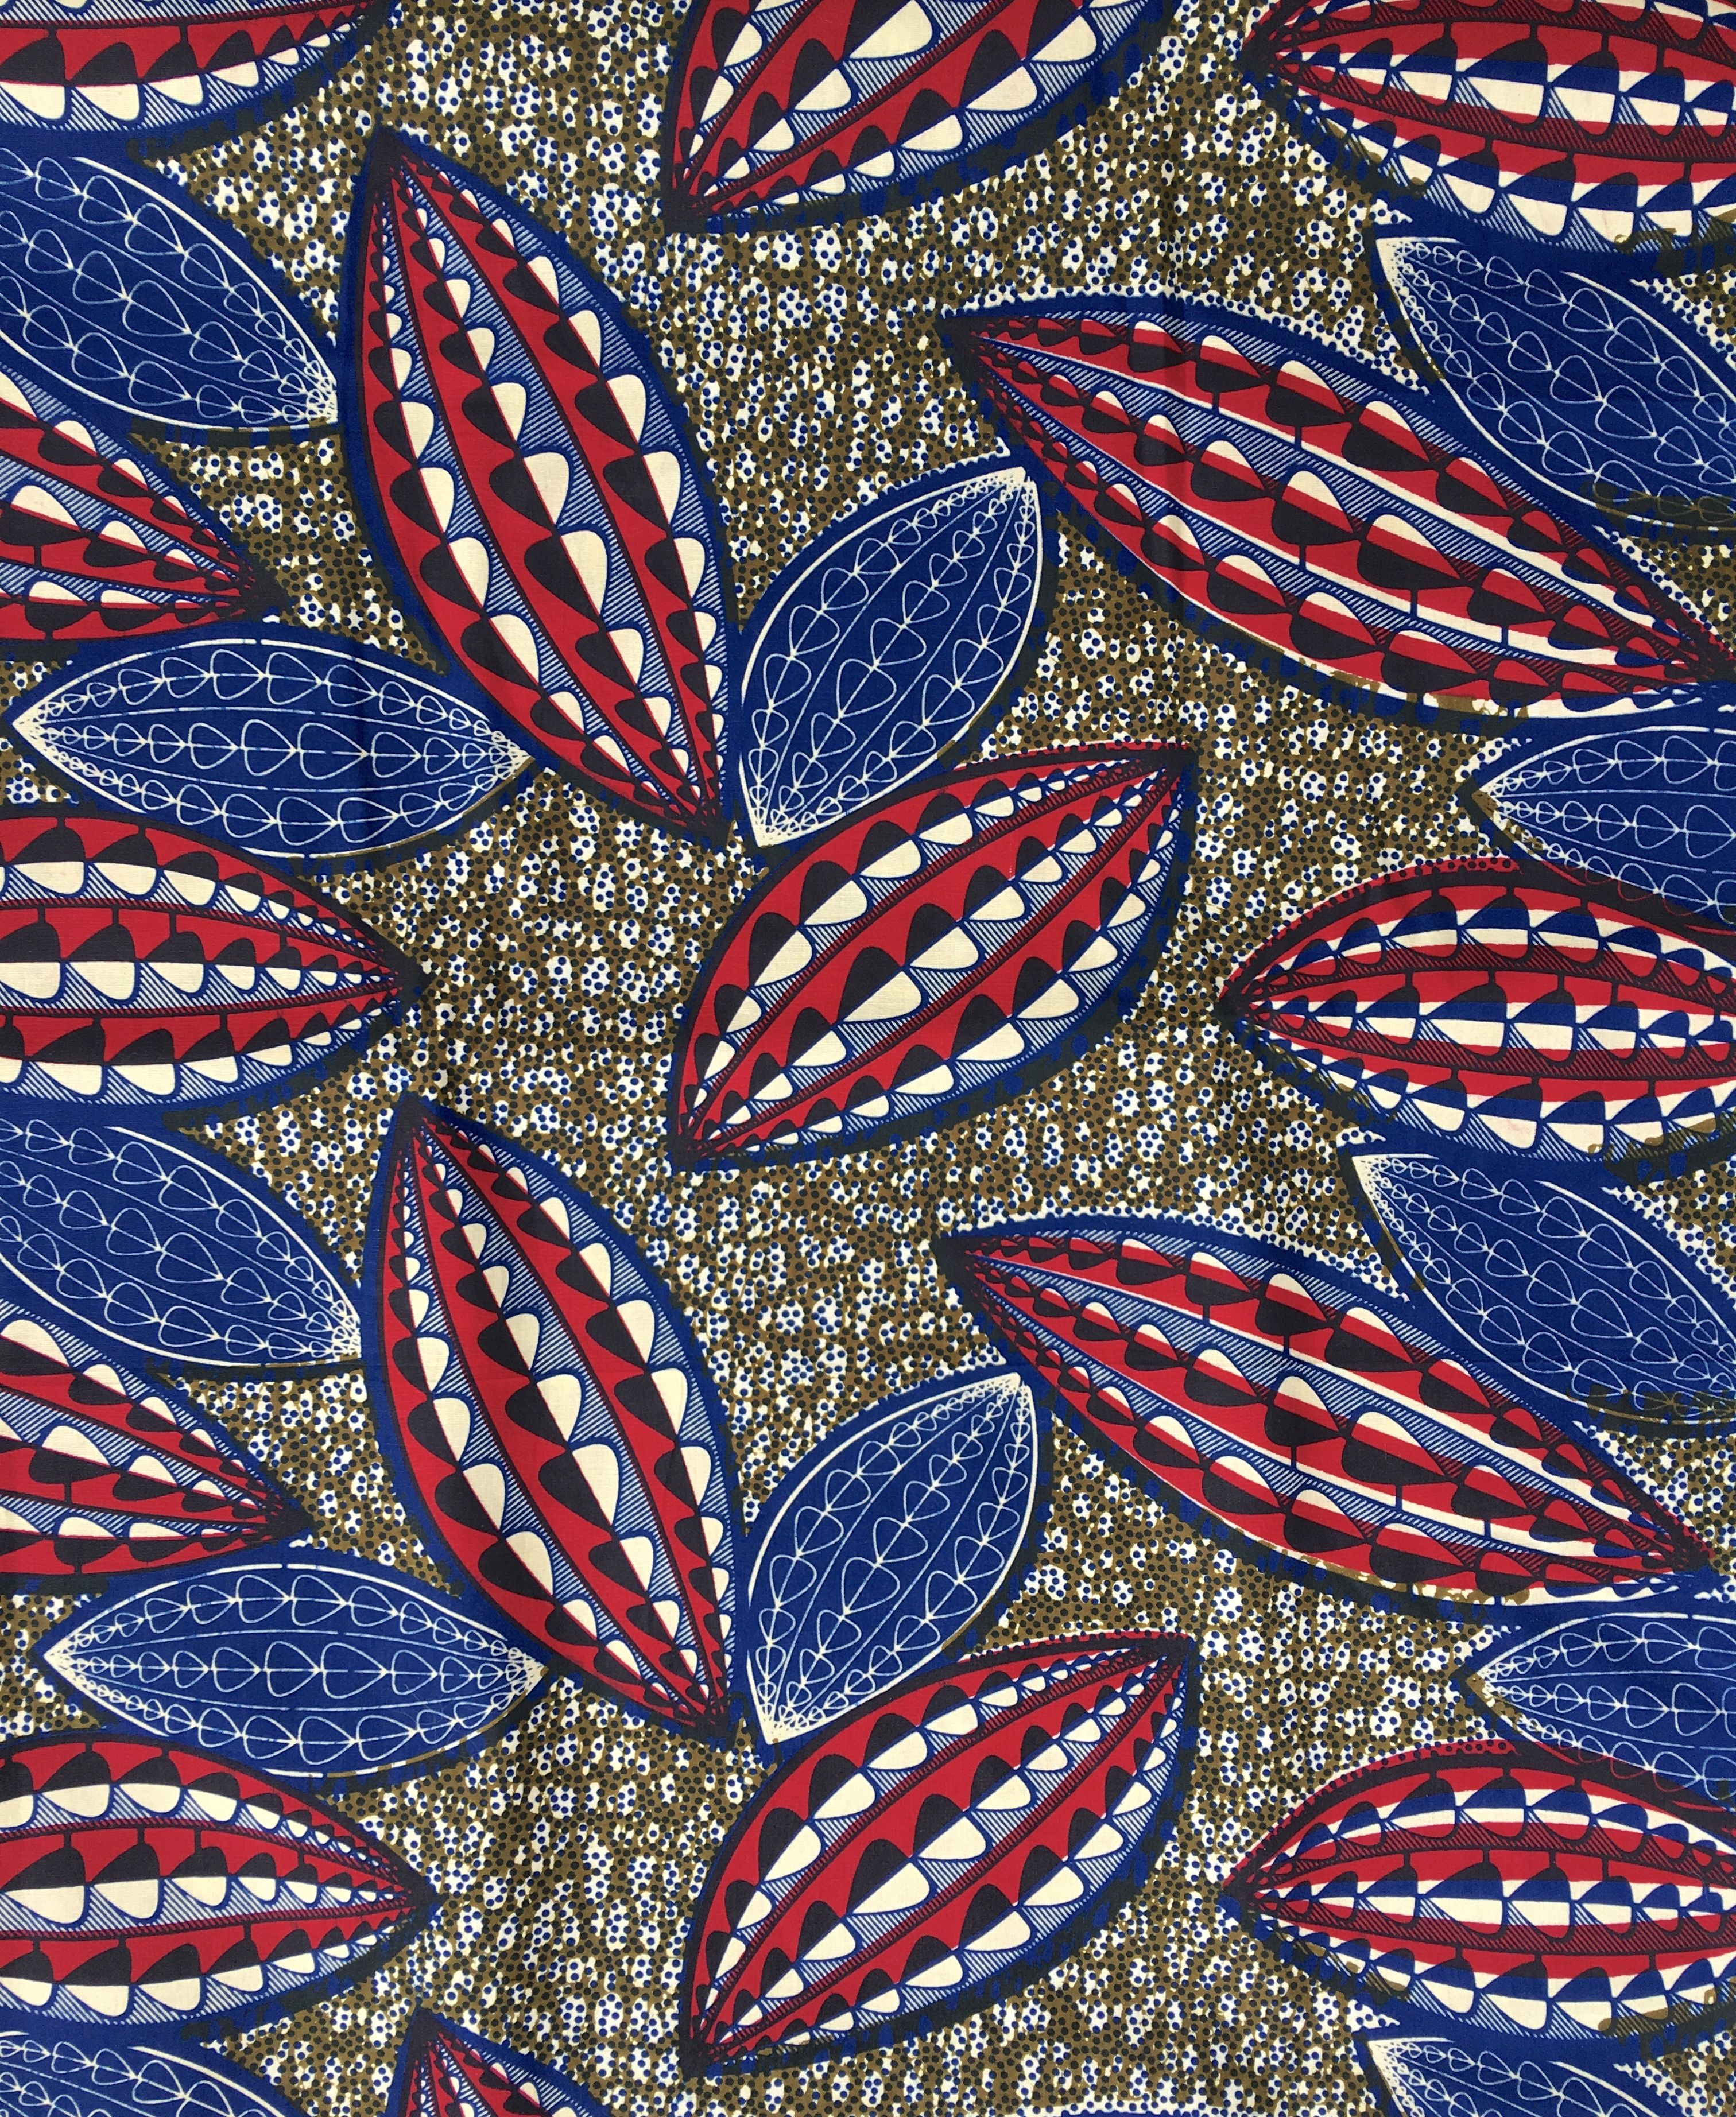 tissu wax cabosse de cacao tendance wax et autres tissus ethniques pinterest tissu. Black Bedroom Furniture Sets. Home Design Ideas